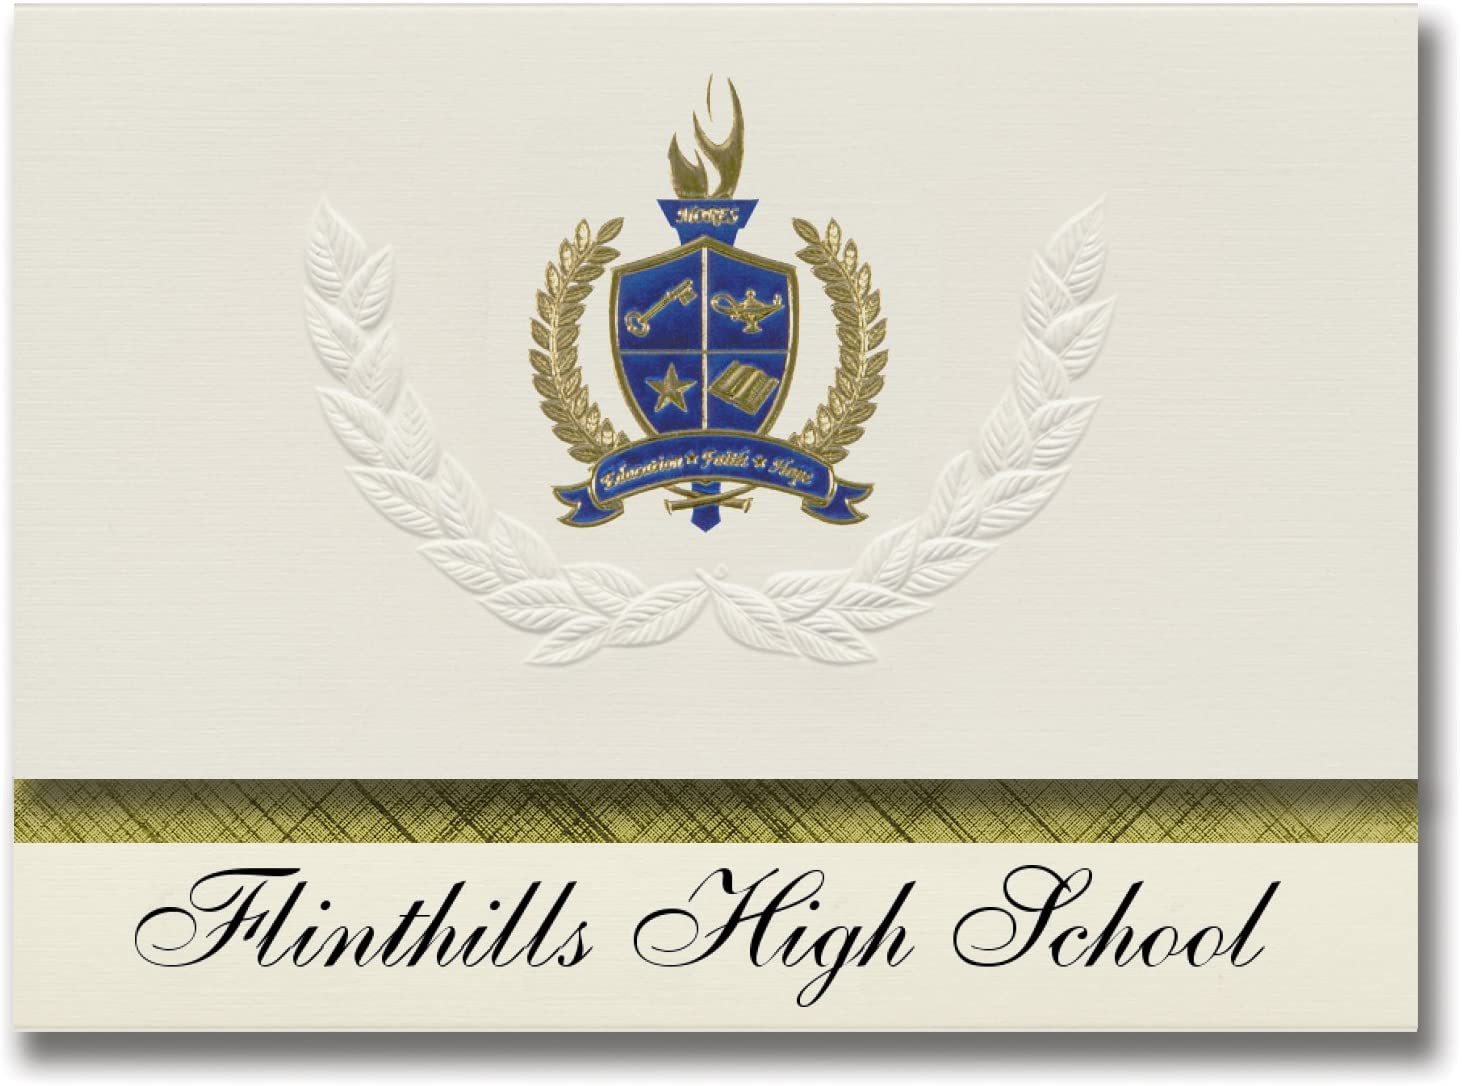 Signature Announcements Flinthills High School (Rosalia, KS) Graduation Announcements, Presidential style, Elite package of 25 with Gold & Blue Metallic Foil seal